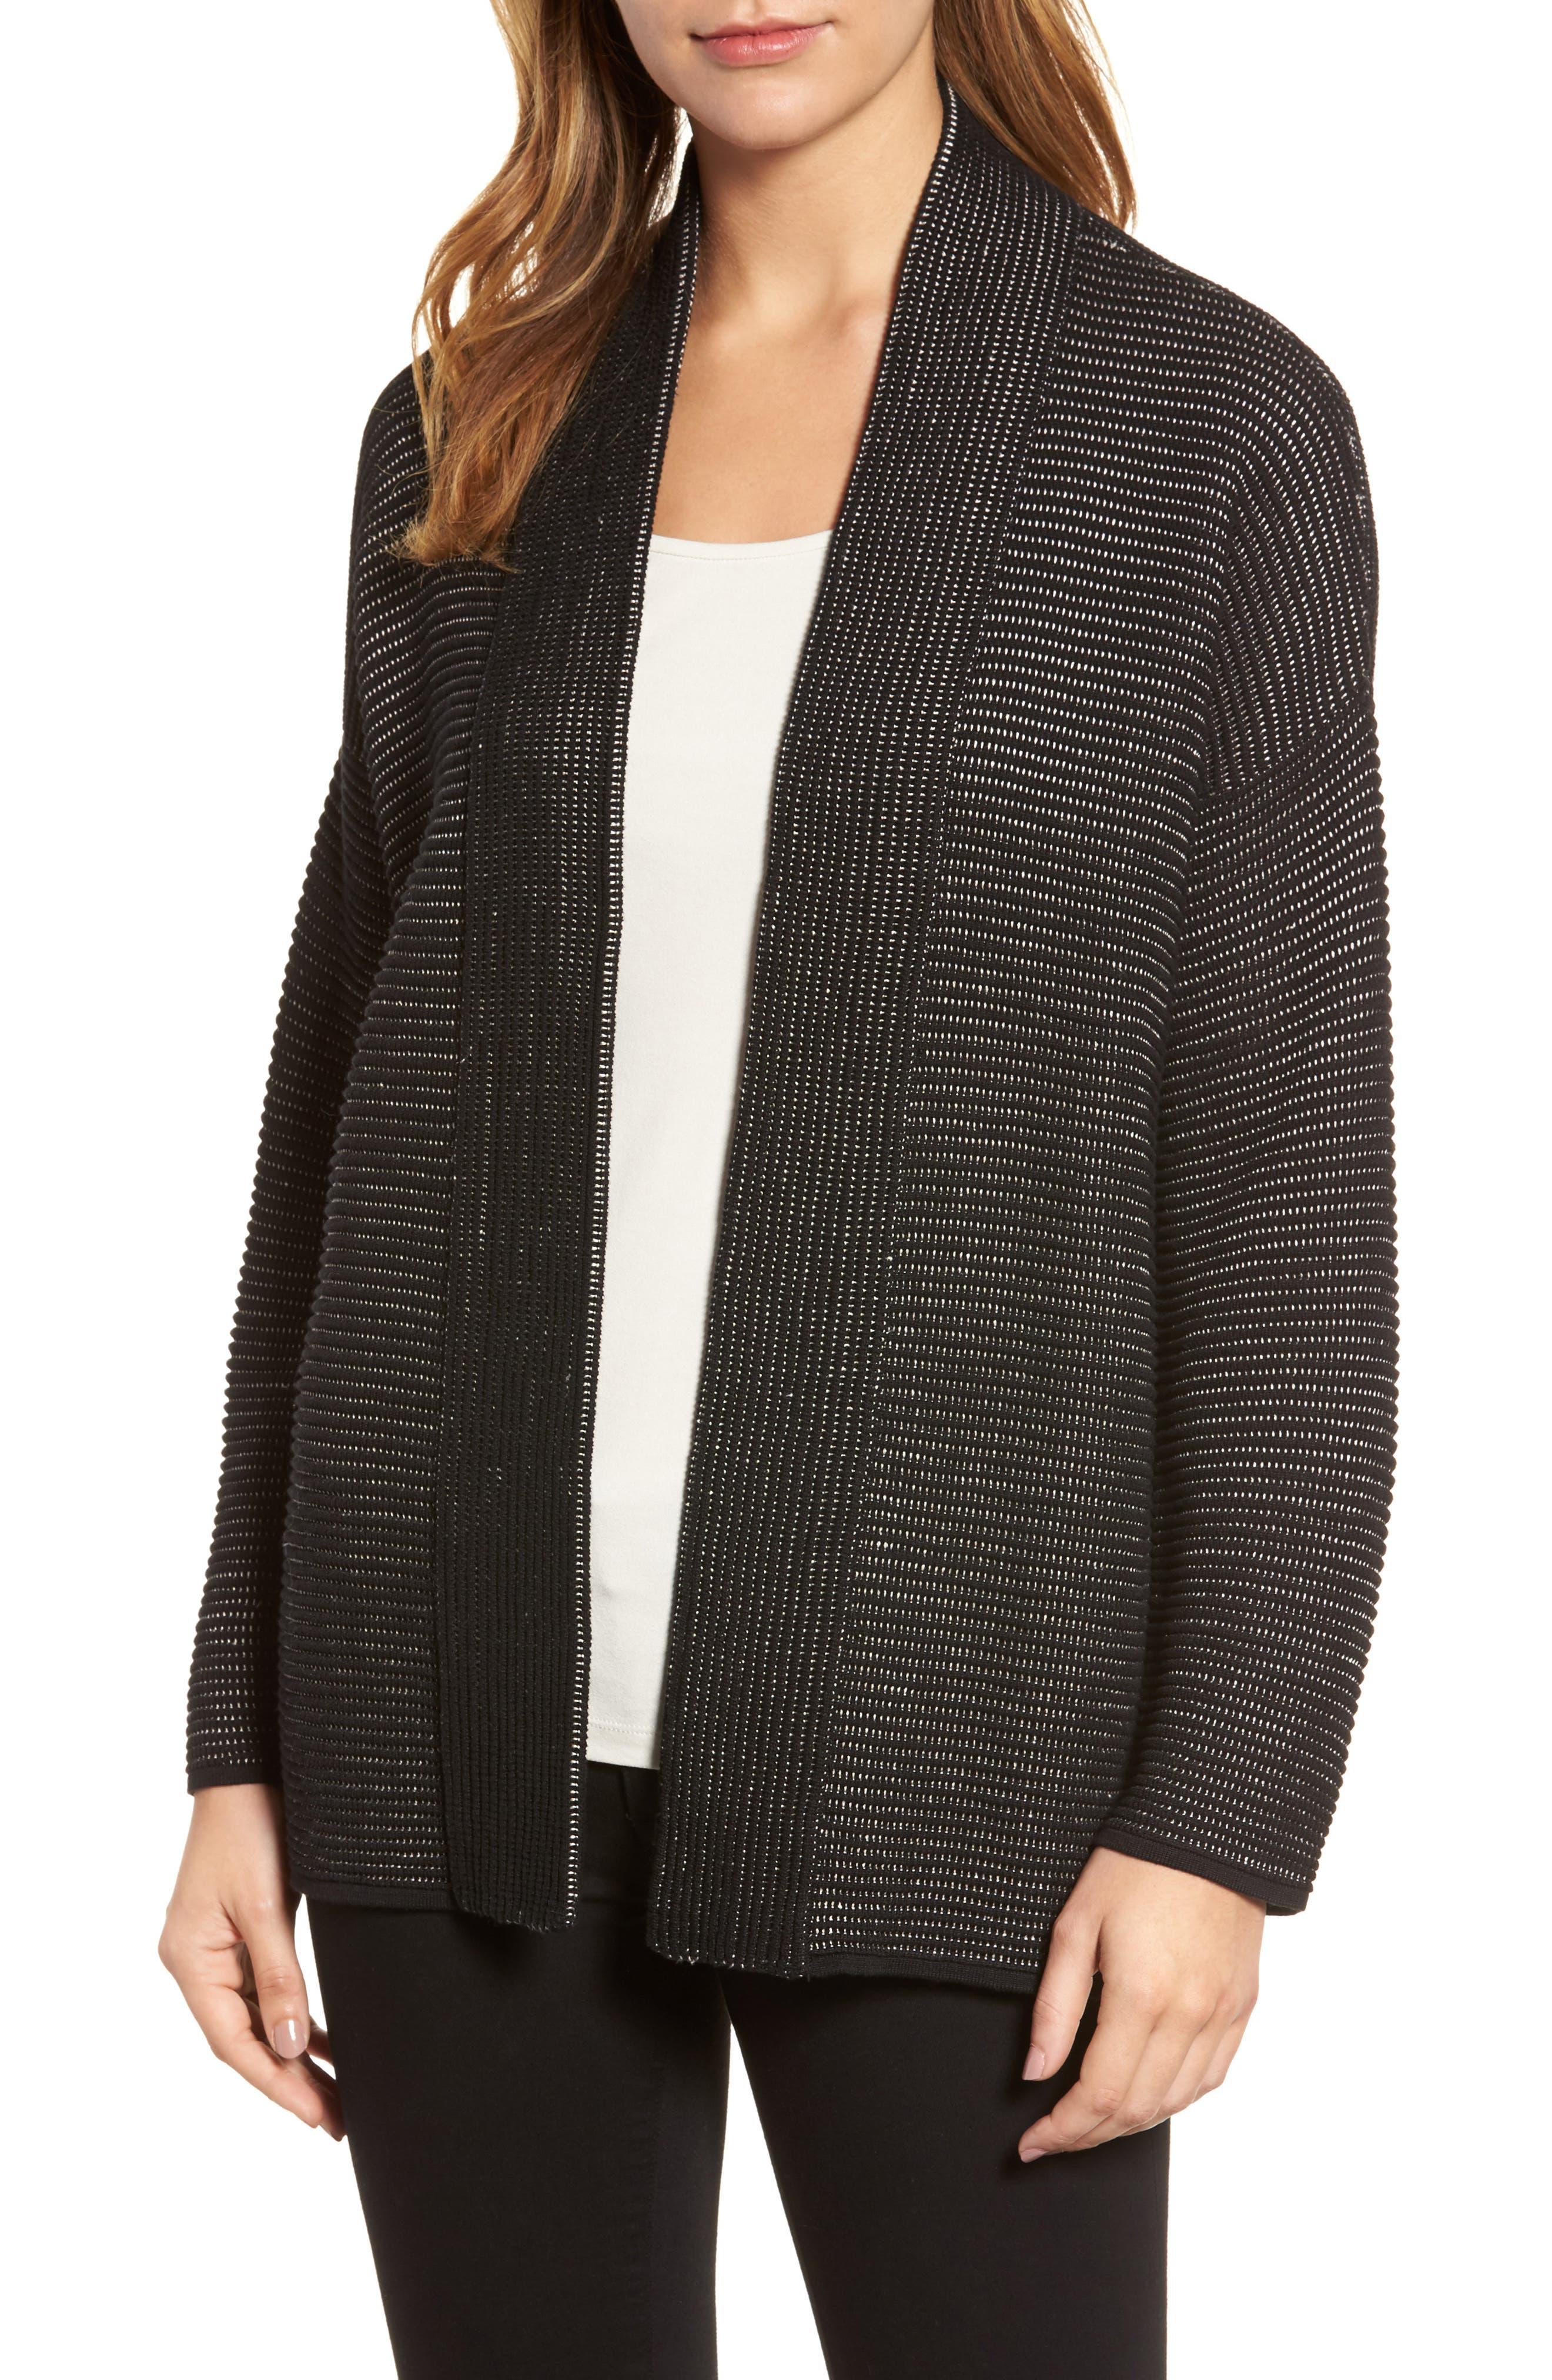 Alternate Image 1 Selected - Eileen Fisher Silk Blend Ottoman Knit Cardigan